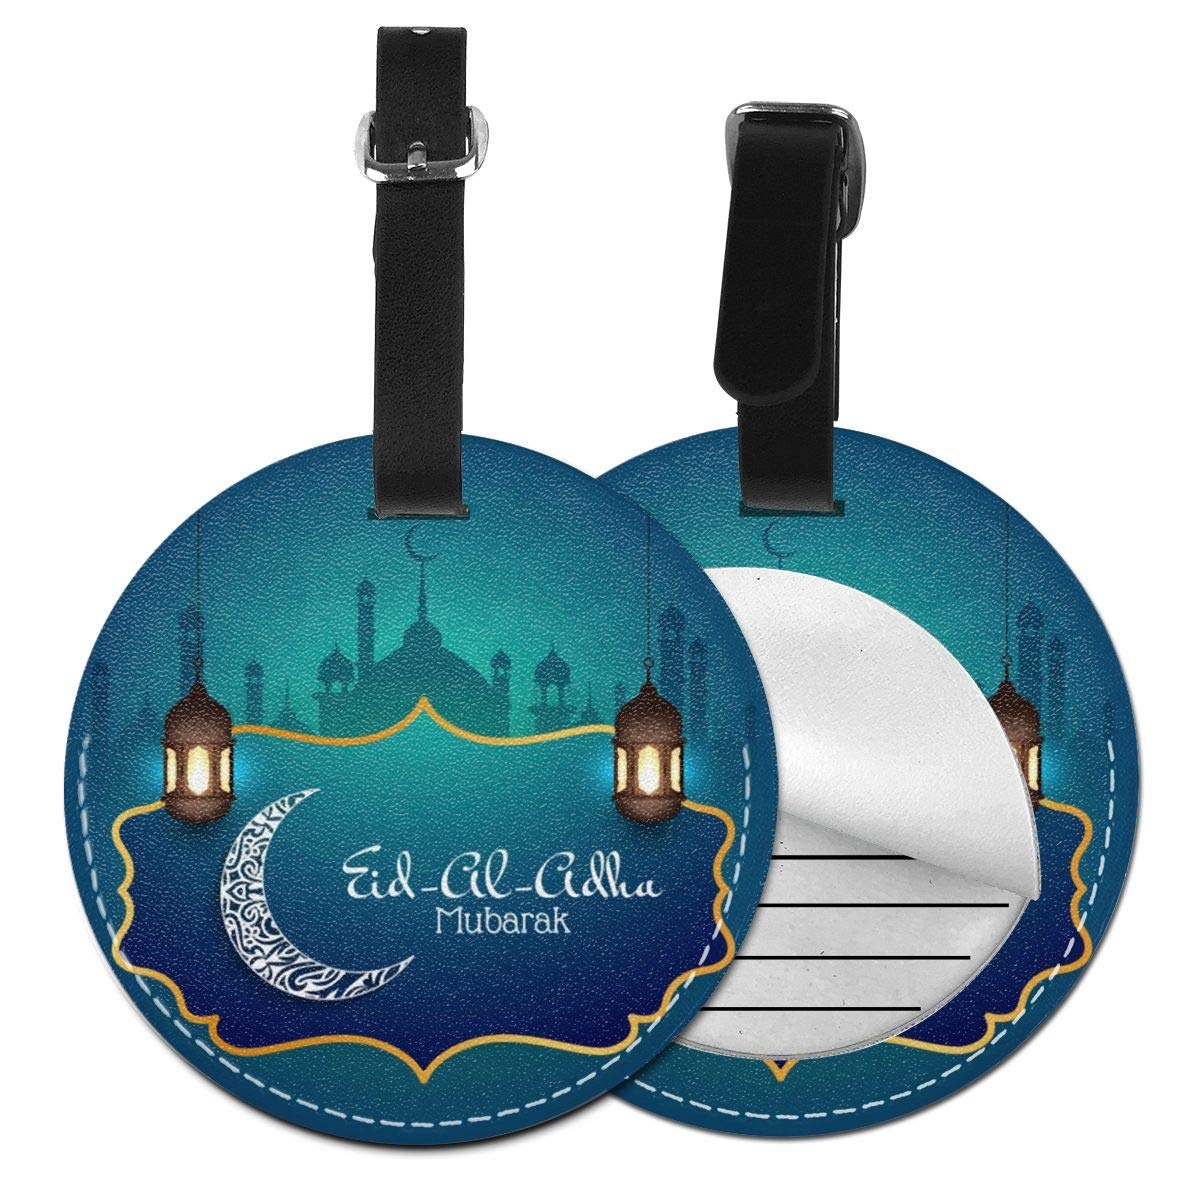 1pcs,2pcs,4pcs Eid Al-Adha Pu Leather Double Sides Print Round Luggage Tag Mutilple Packs